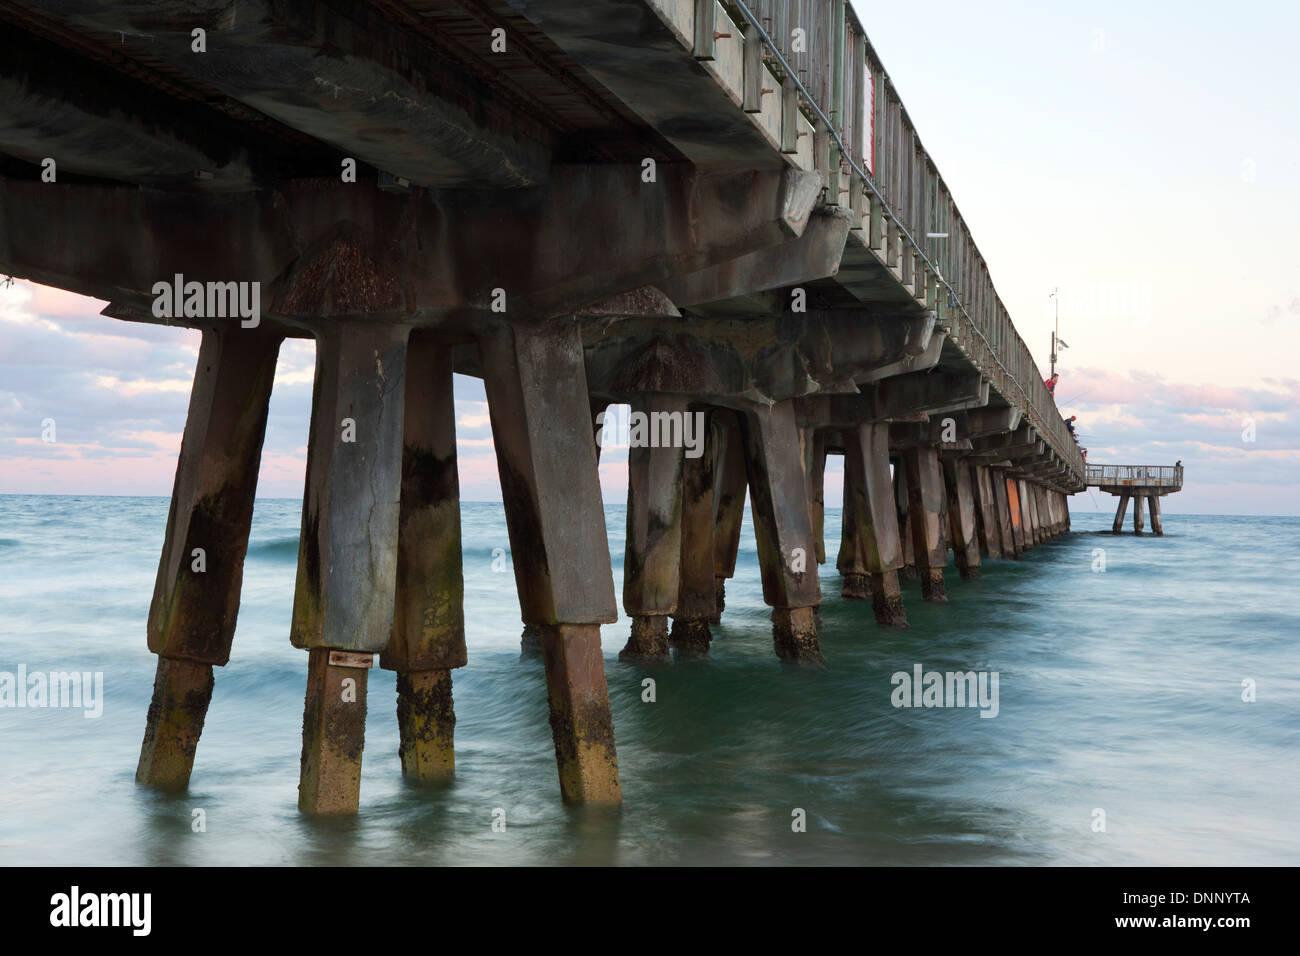 Pompano Beach Pier - Pompano Beach, Florida USA - Stock Image